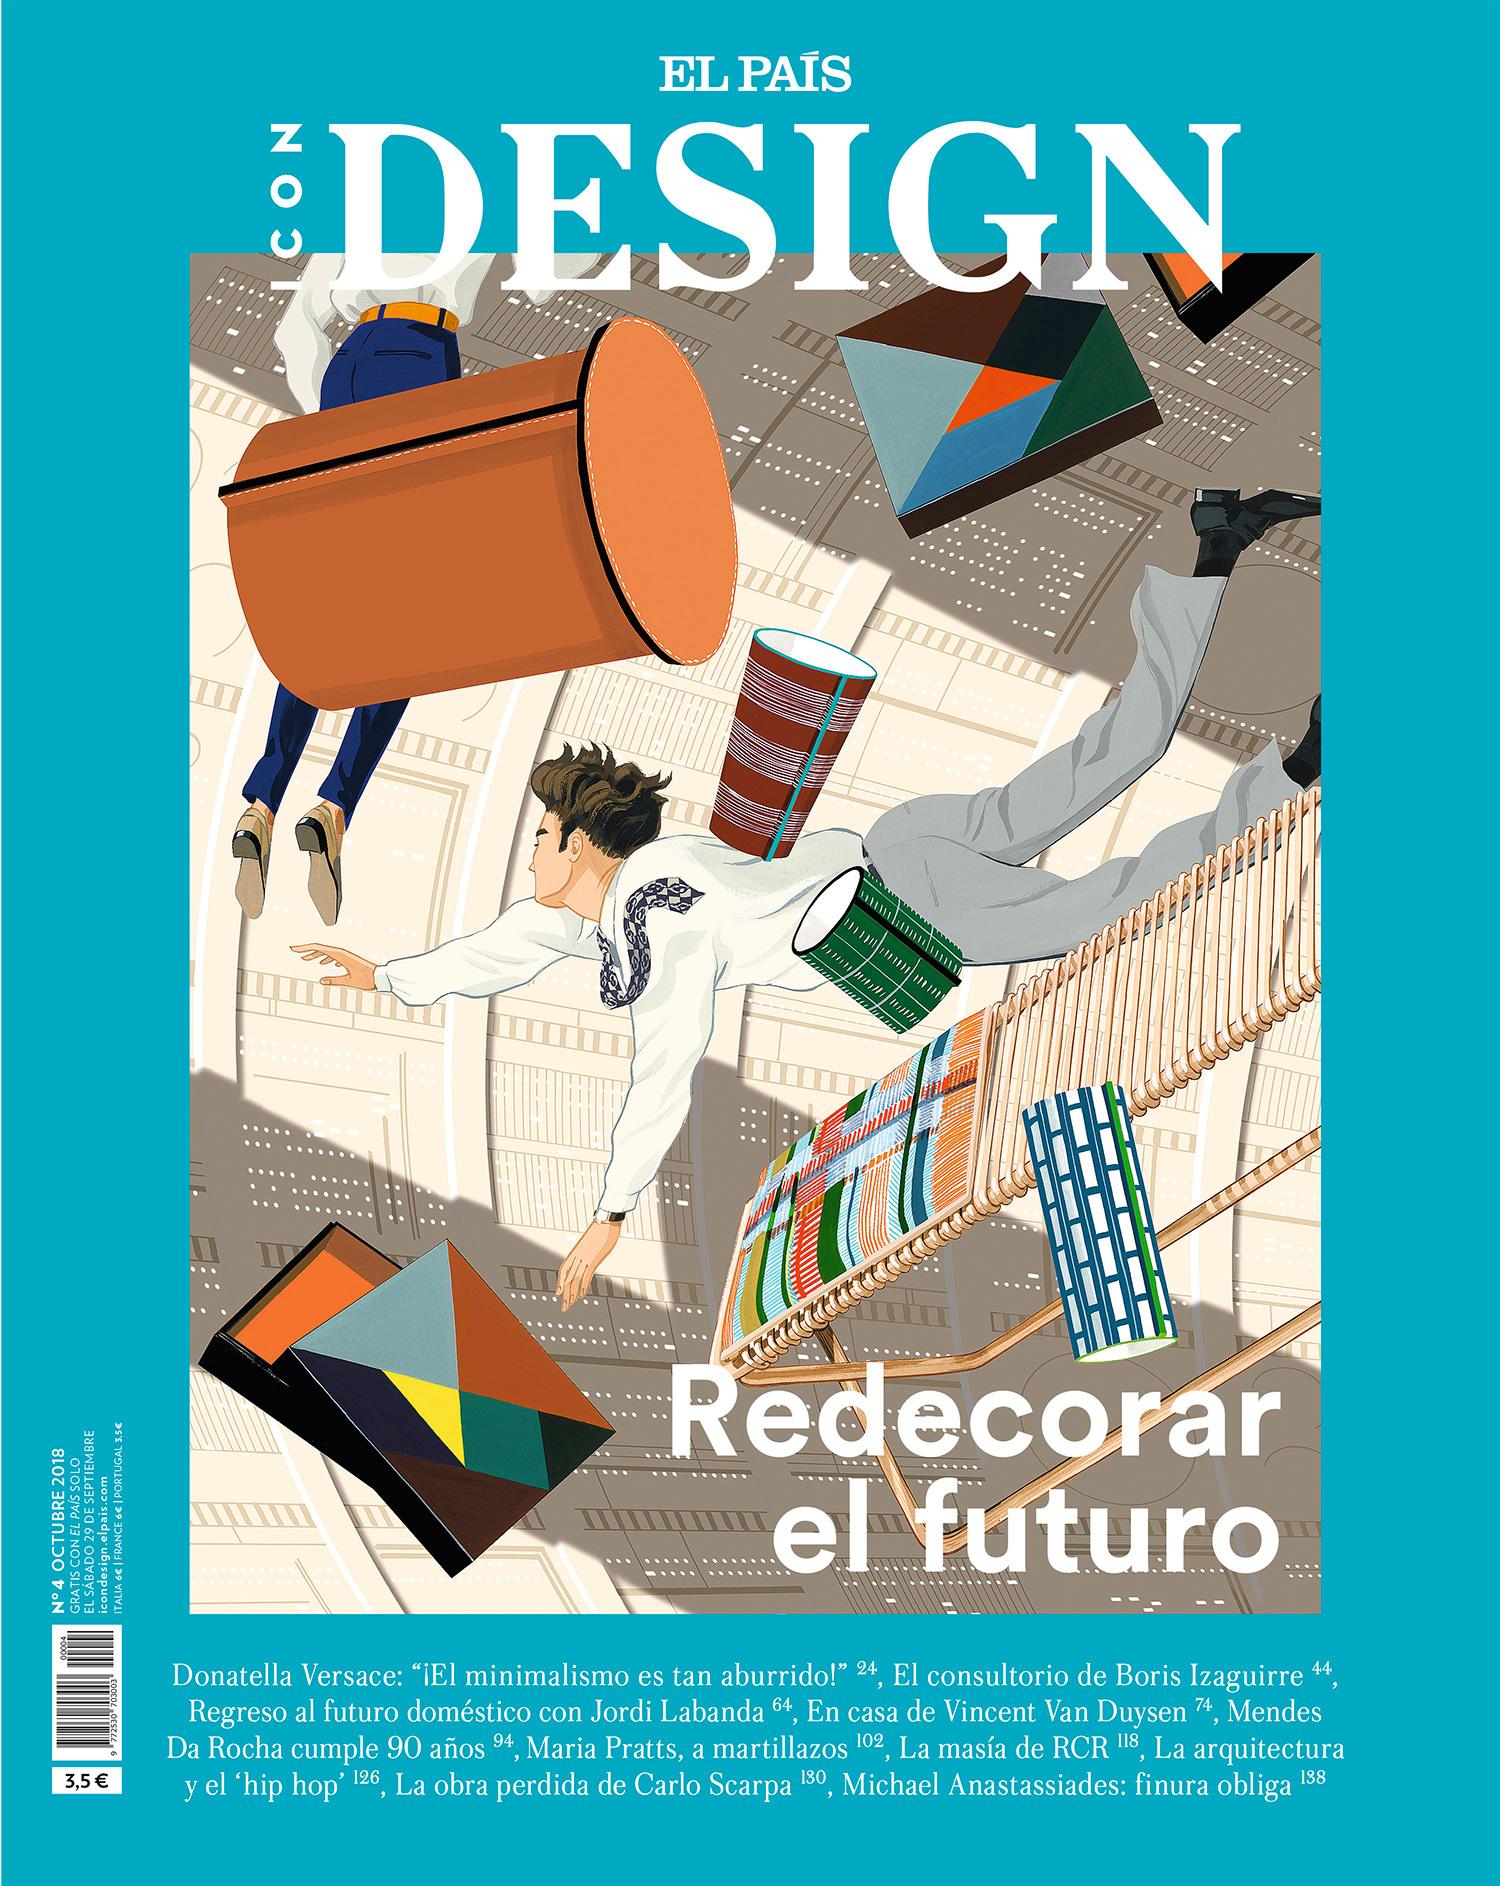 Pub 2018 Icon Design